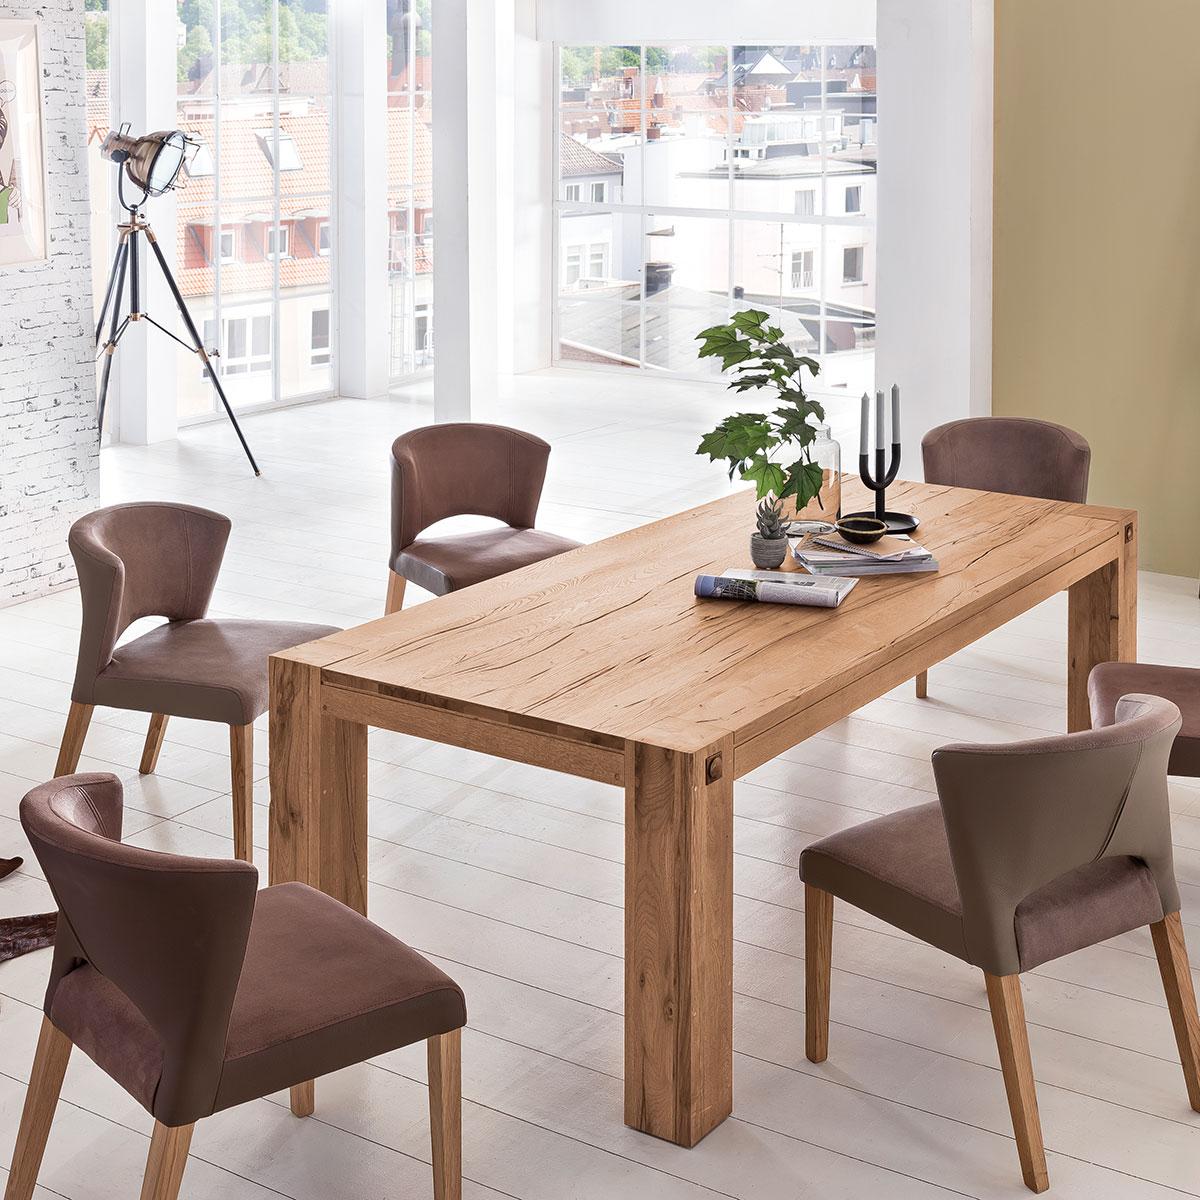 Modernes Esszimmer im Material-Mix | Trends | Design & Lifestyle ...